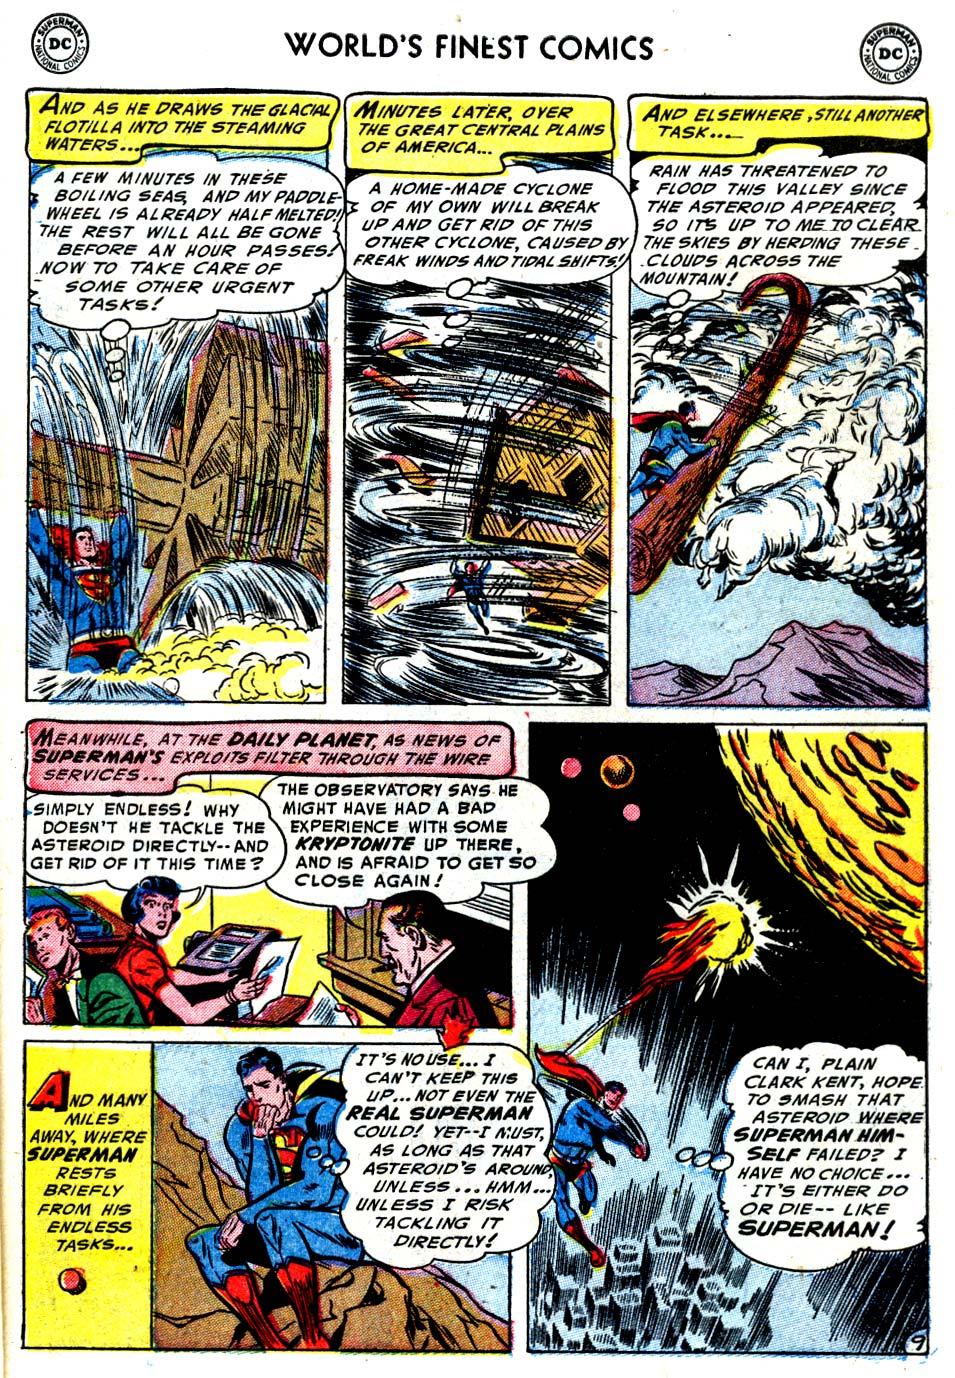 Read online World's Finest Comics comic -  Issue #68 - 11